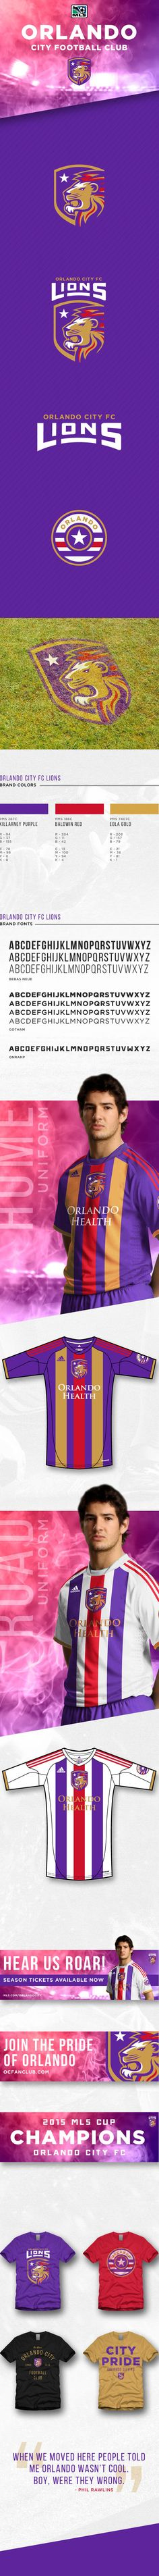 Orlando City Football Club - Identity proposal by Brandon Moore, via Behance